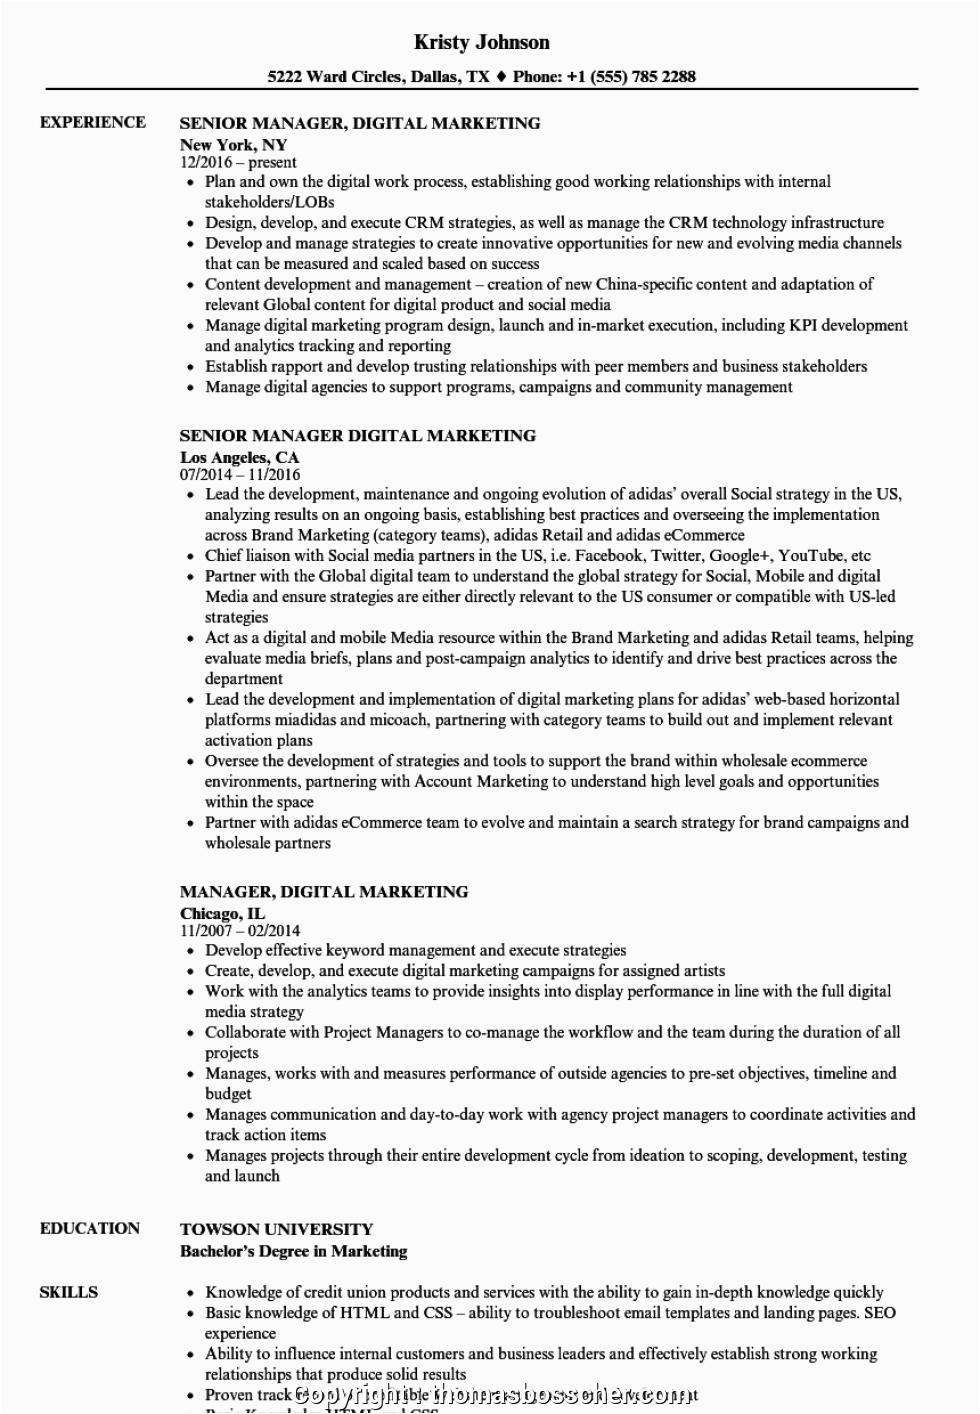 simply digital marketing resume for fresher